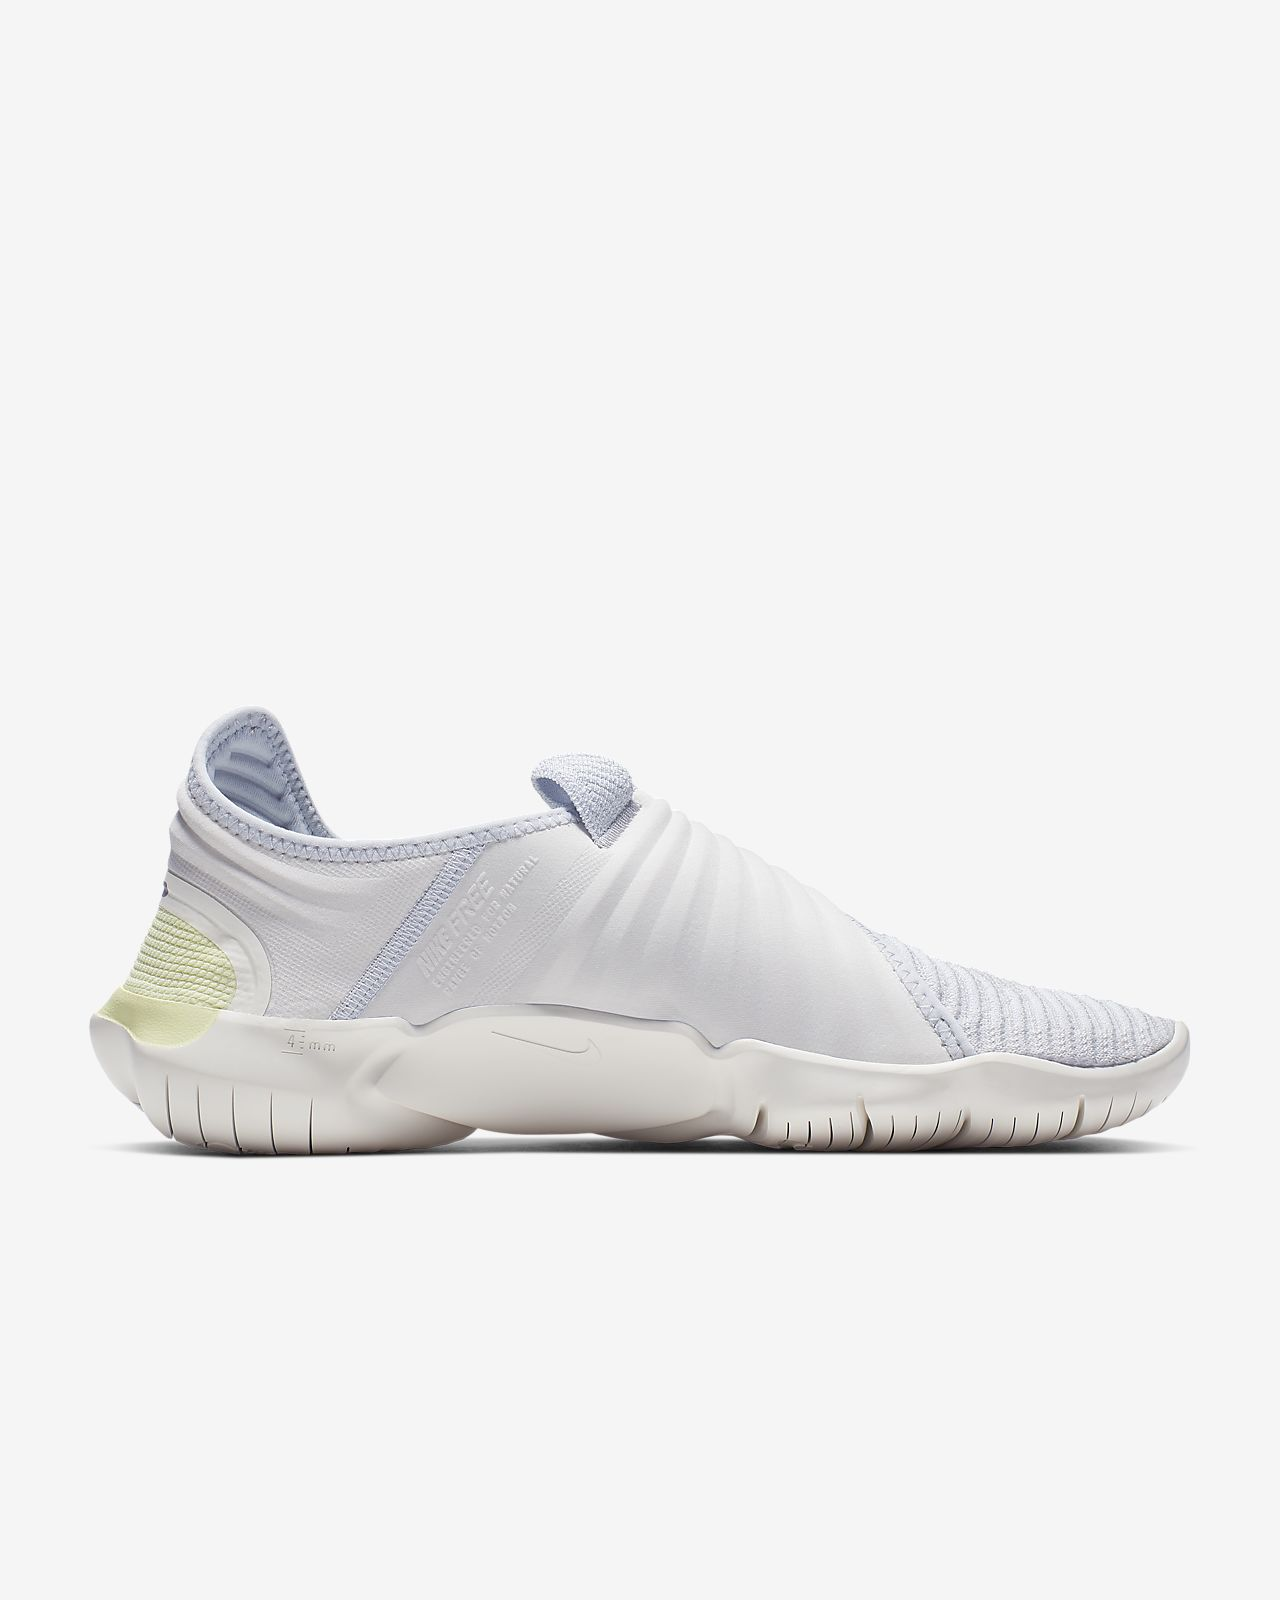 e0ad7c8964d Nike Free RN Flyknit 3.0 Men s Running Shoe. Nike.com DK